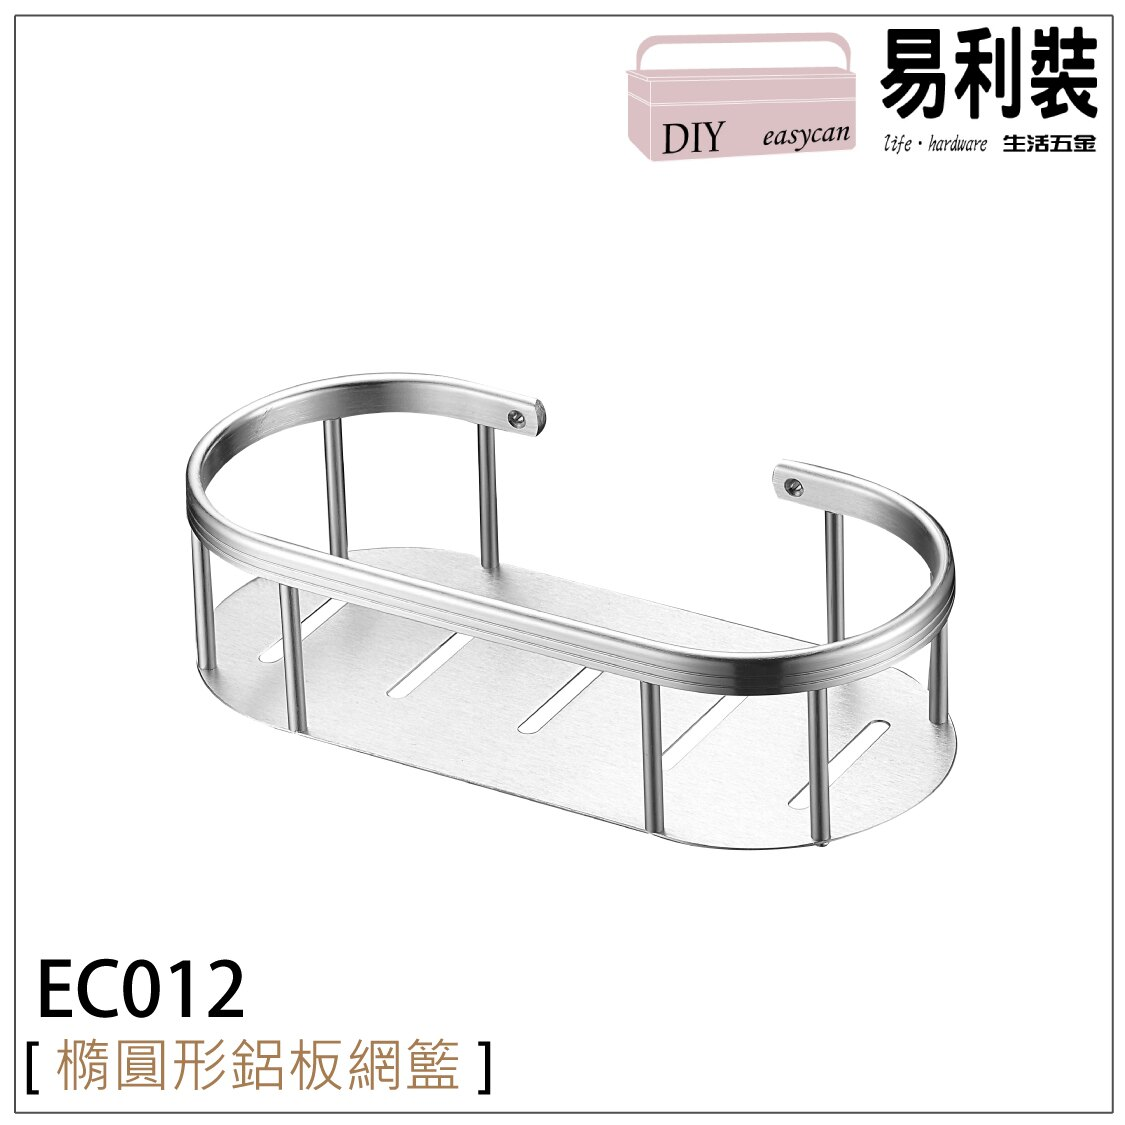 【 EASYCAN  】EC012 橢圓形鋁板網籃 易利裝生活五金 鋁合金 置物架 收納架 廚房 餐廳 房間 浴室 小資族